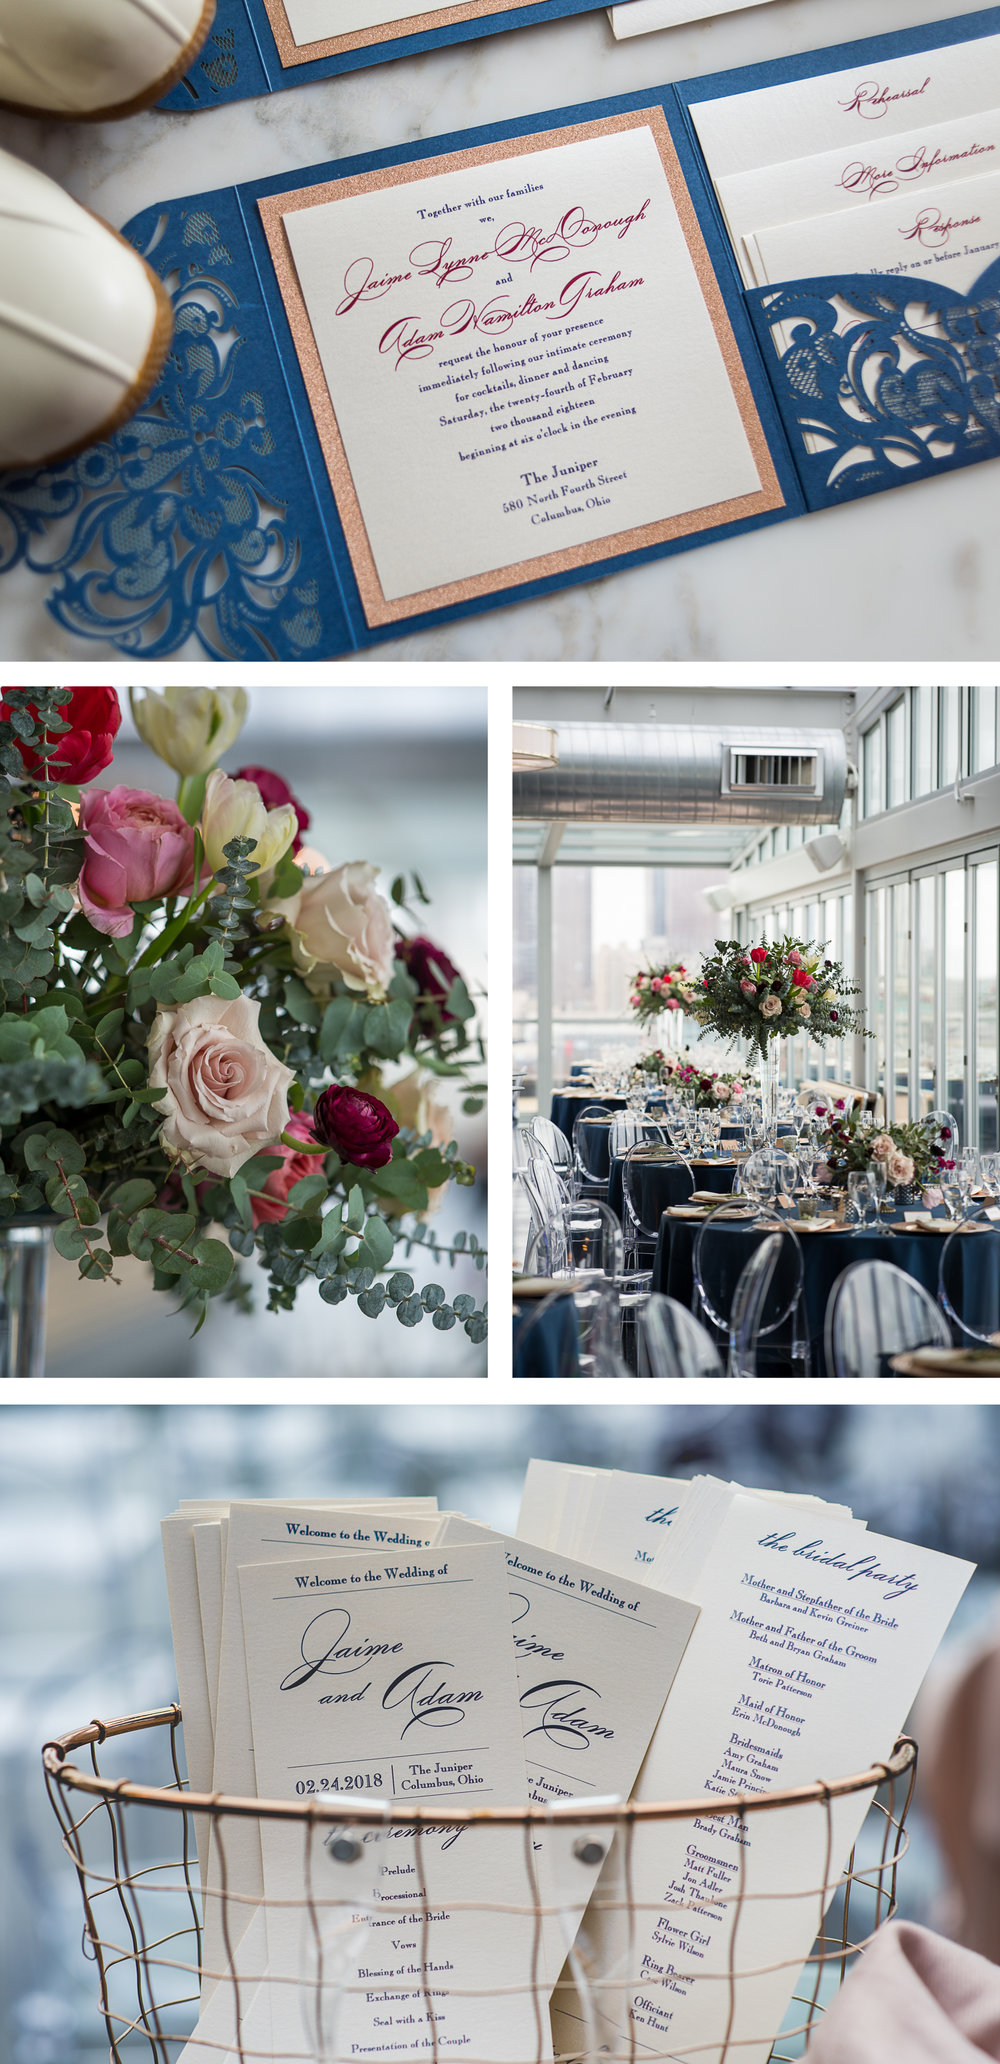 Brett Loves Elle, Columbus Wedding Photographers, Columbus Wedding Photography, Ohio Wedding, Juniper Rooftop Wedding, Vintage Glam Wedding Details